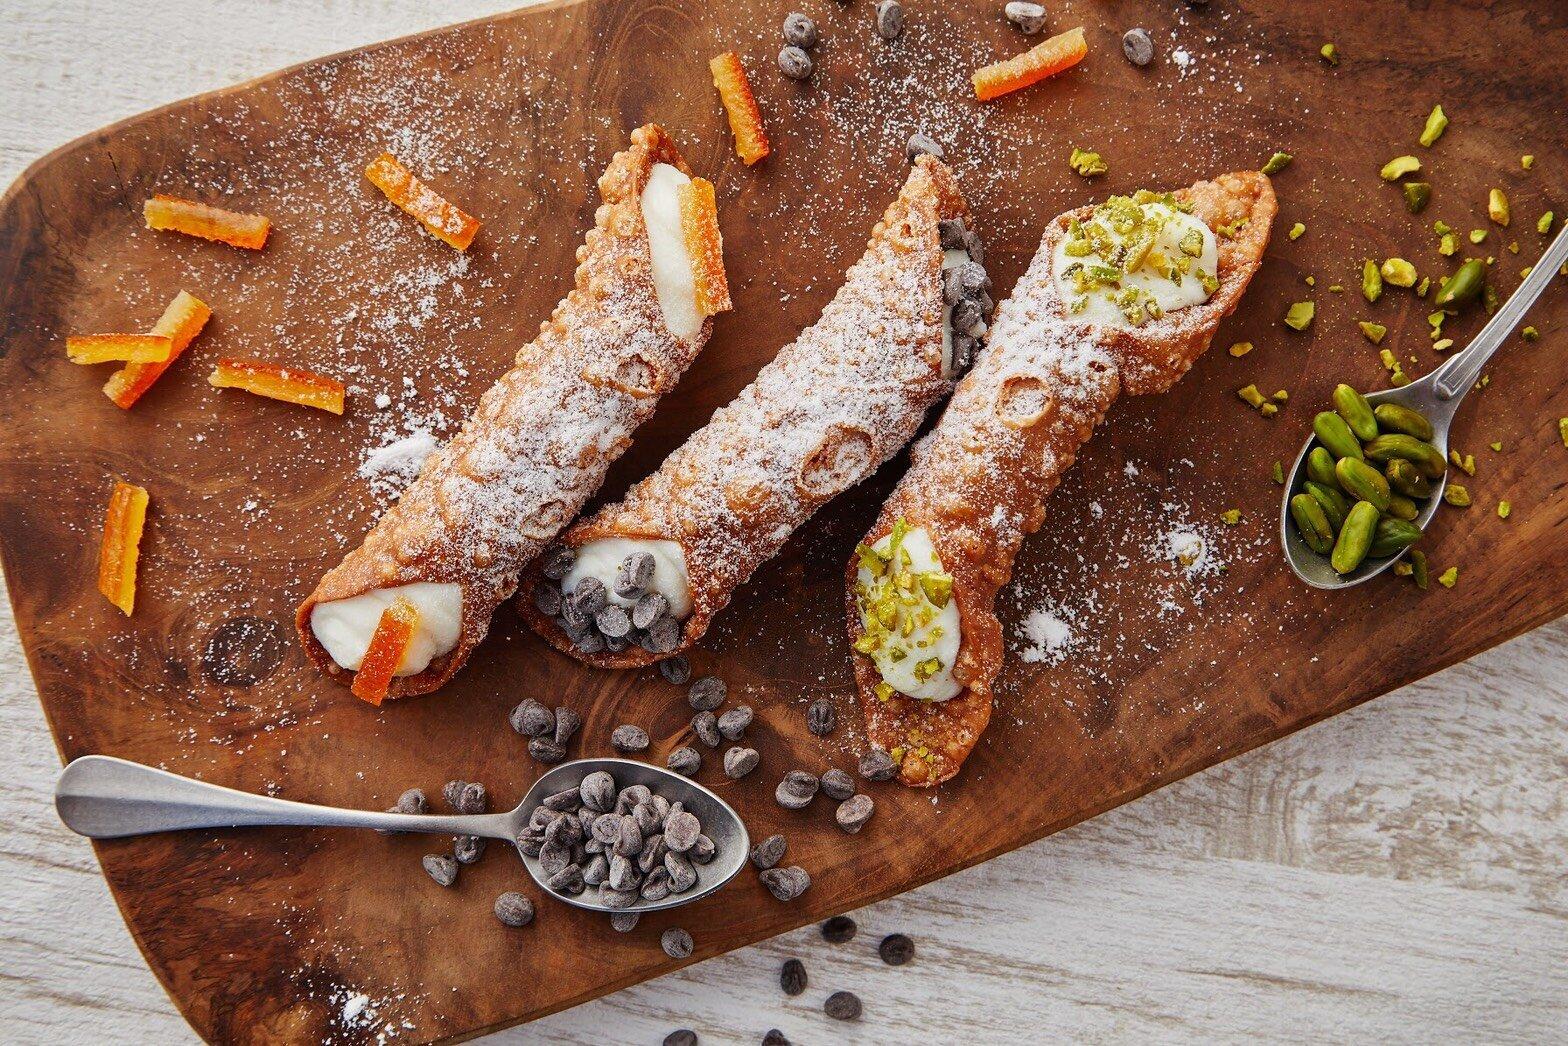 Cannoli卡諾里是西西里島的傳統甜點。